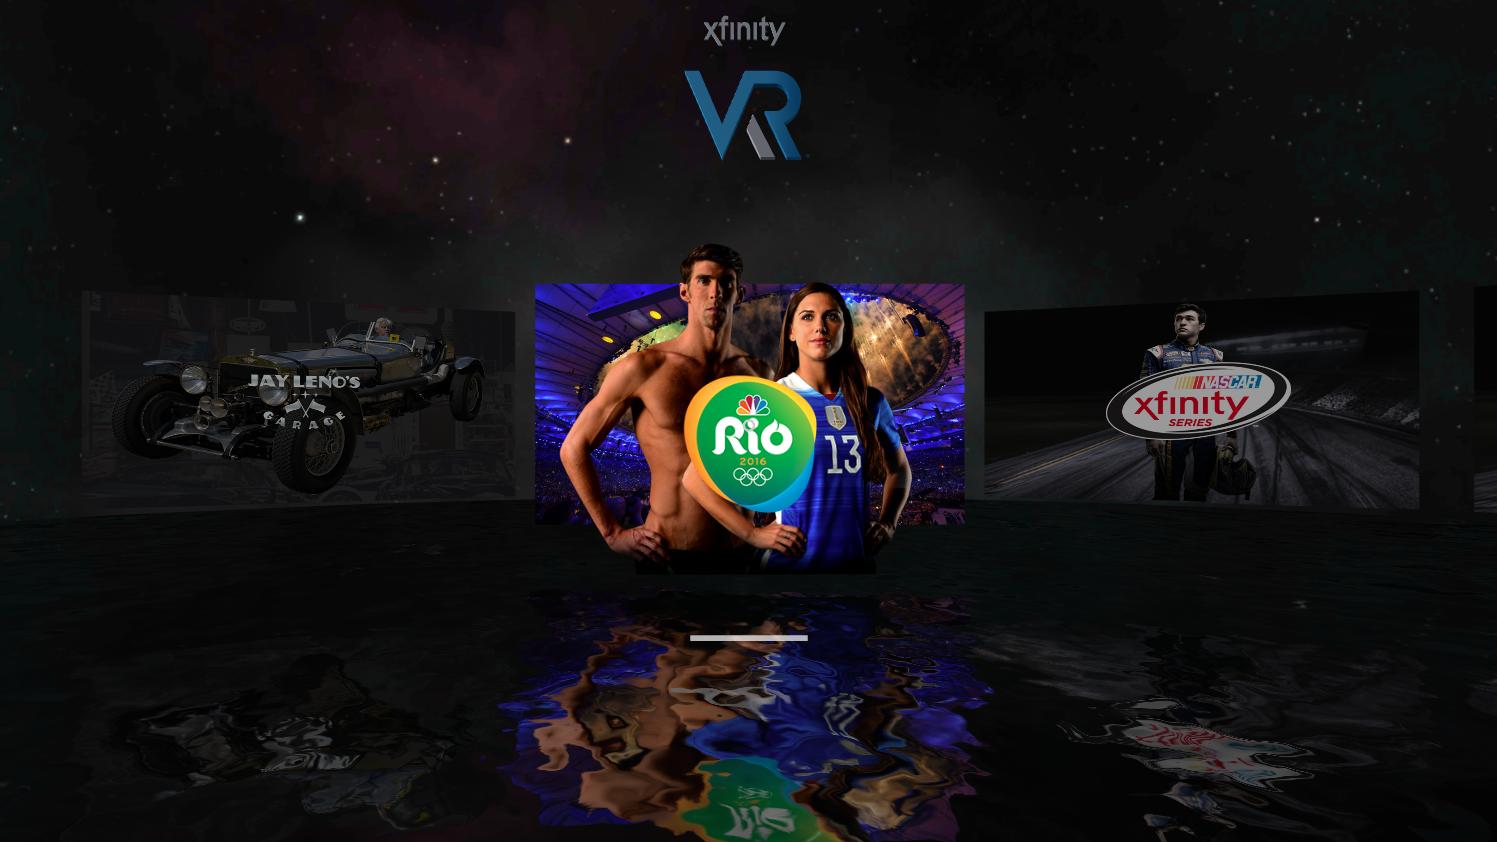 Xfinity VR